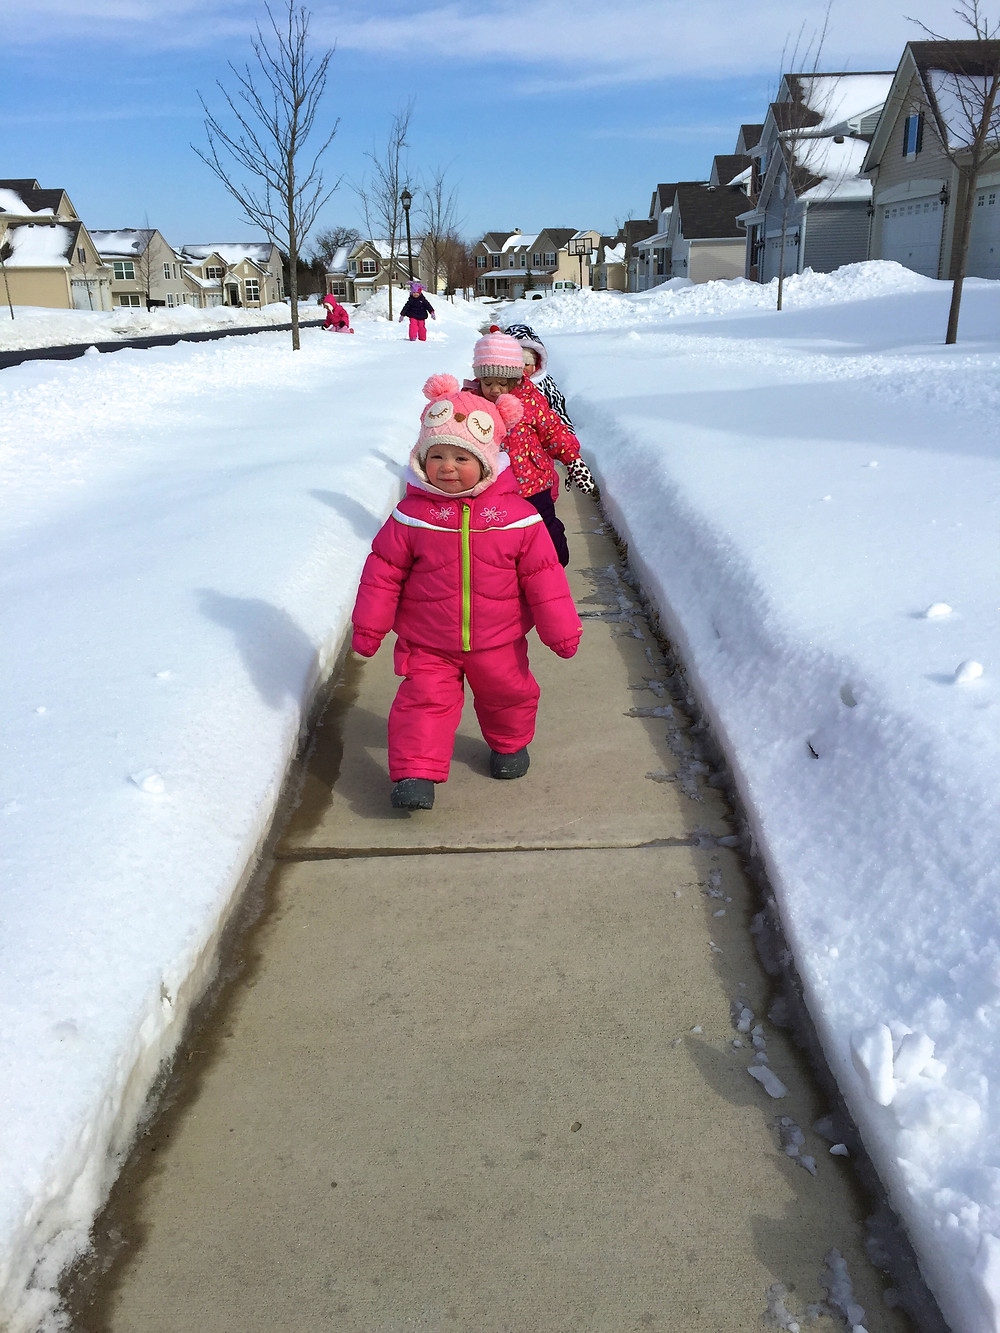 A snowy neighborhood walk for the Blue Sky Daycare children